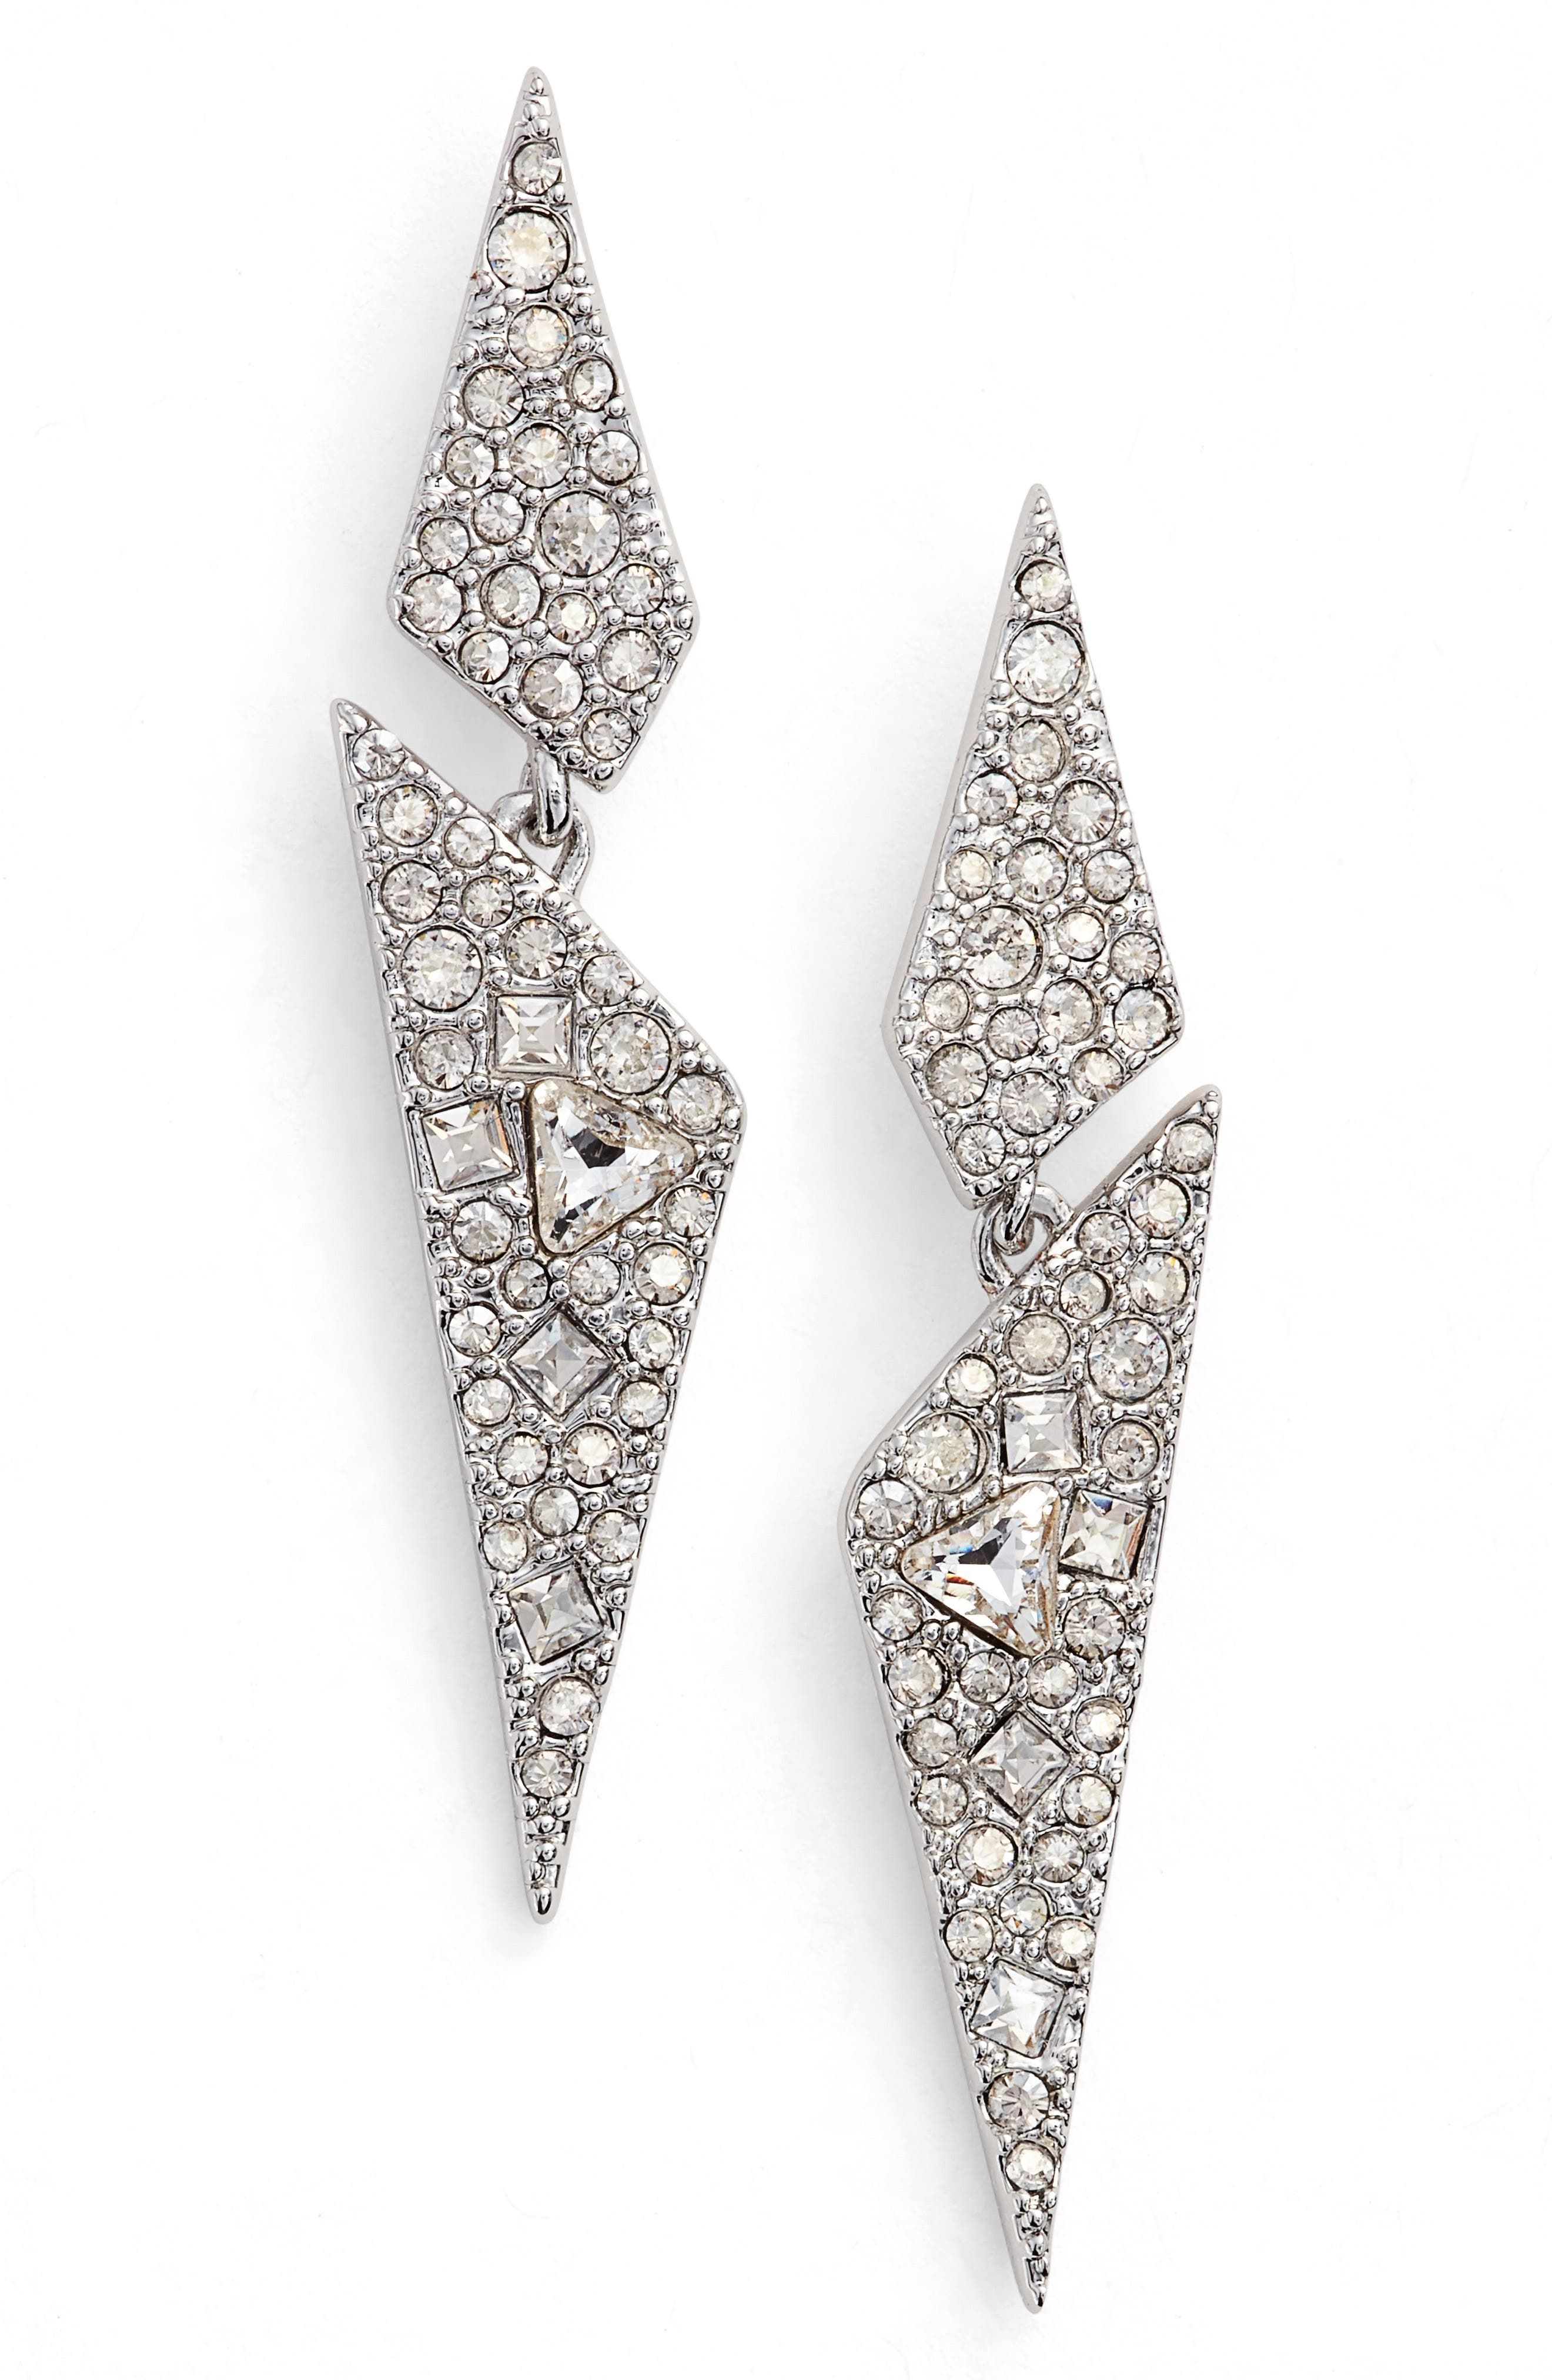 Crystal Encrusted Dangling Drop Earrings,                             Main thumbnail 1, color,                             Gold